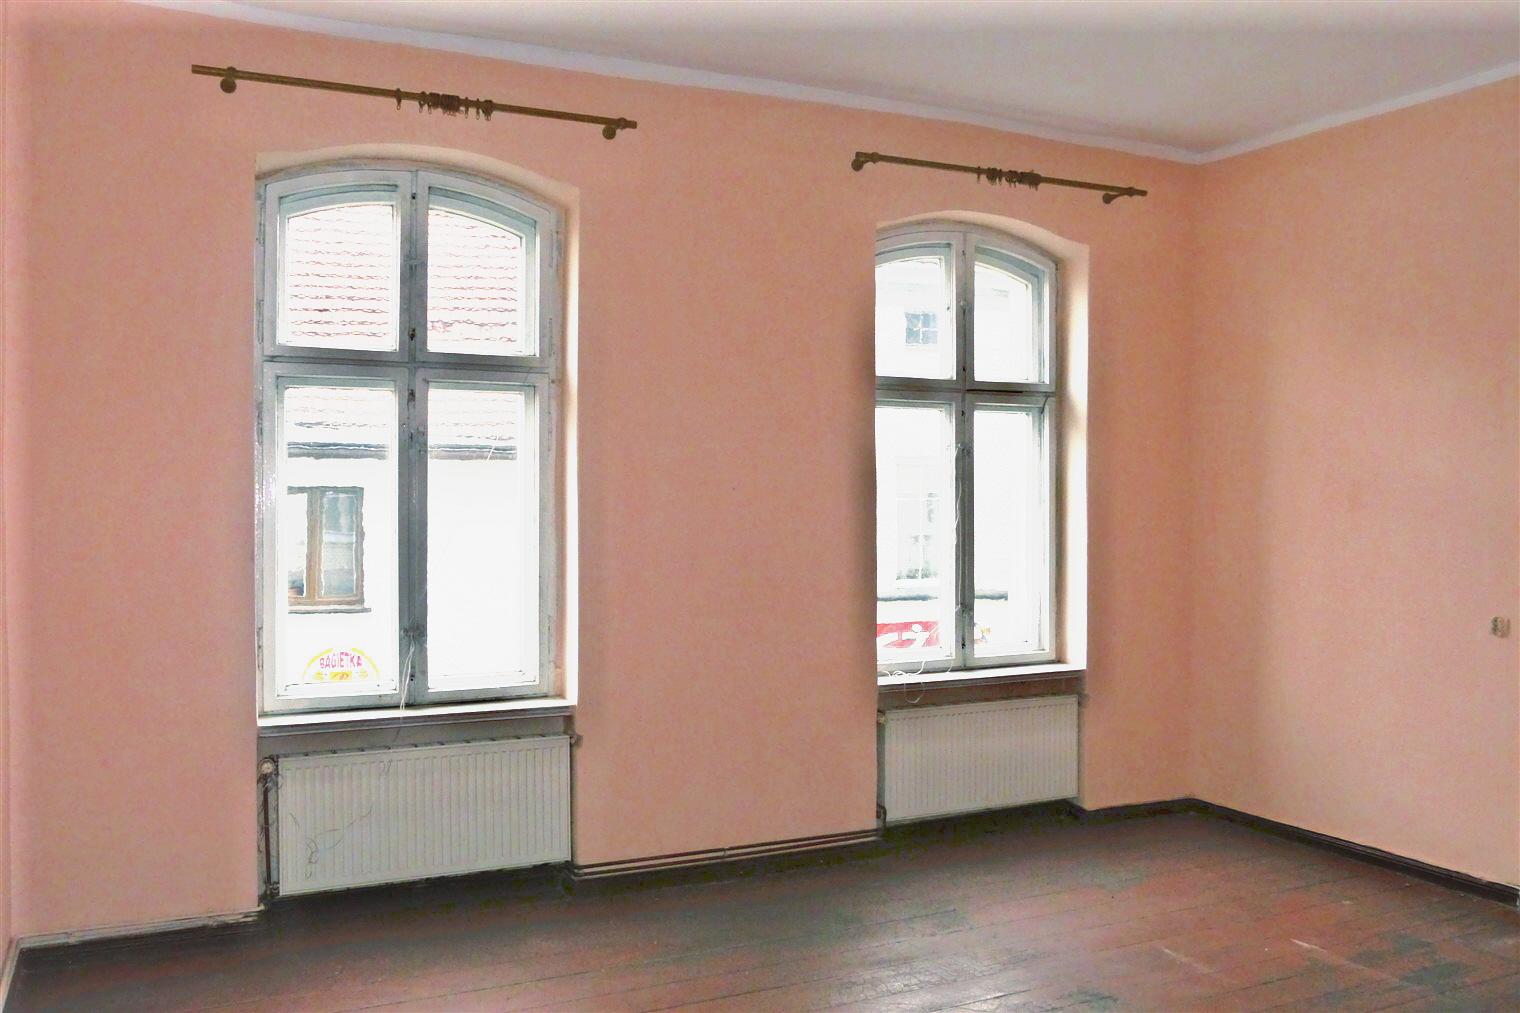 Mieszkanie-Kluczbork-centrum